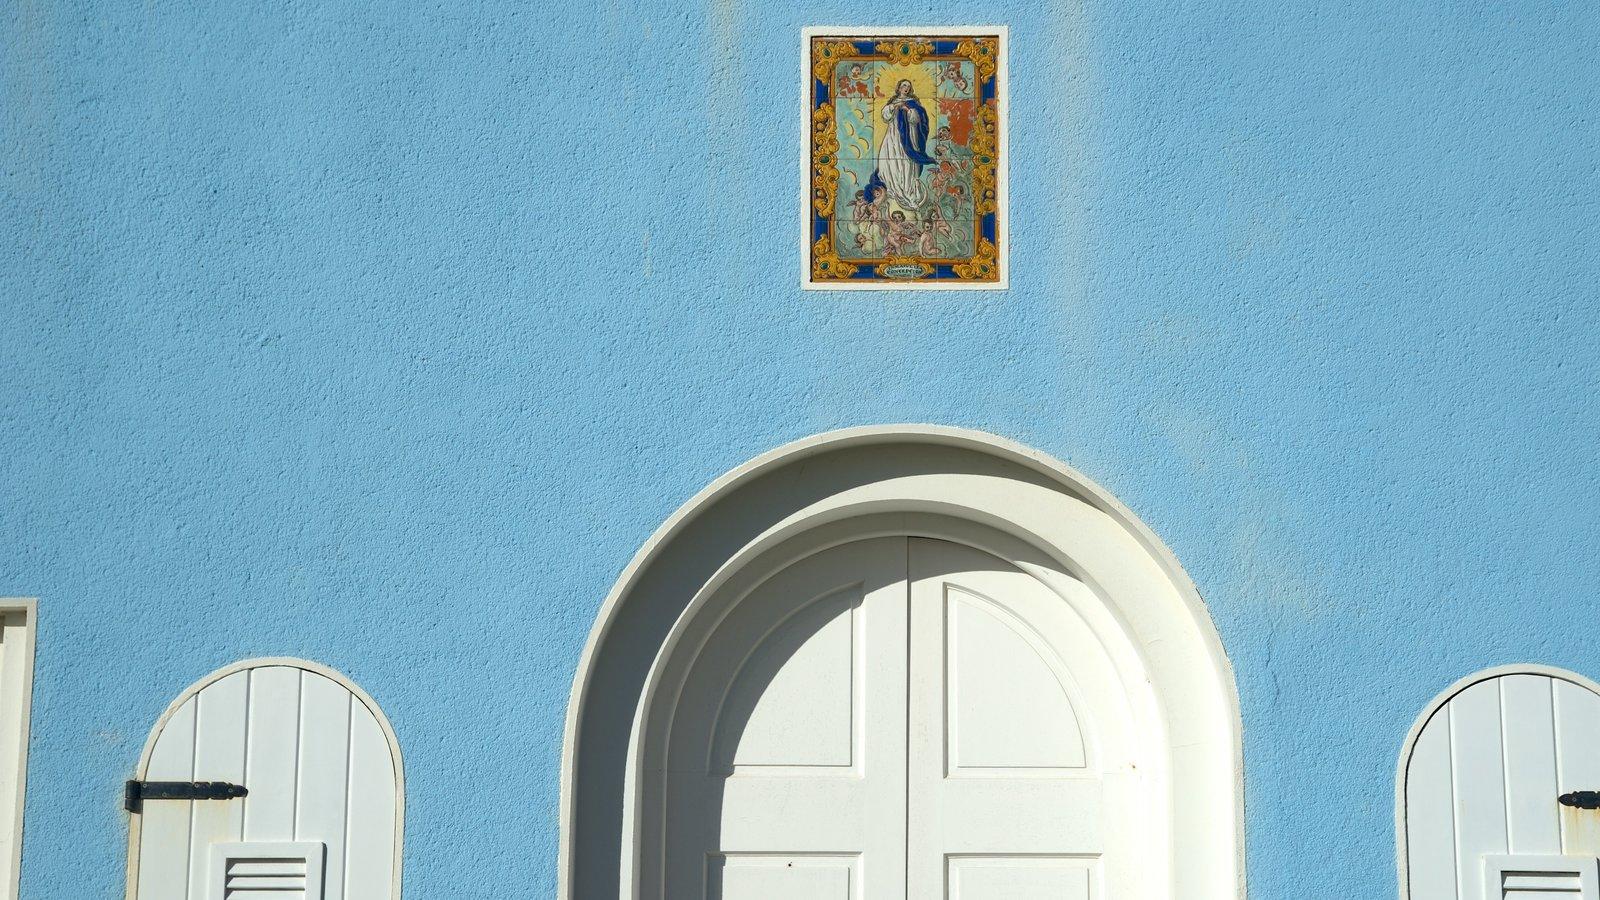 Igreja da Candelária caracterizando uma igreja ou catedral